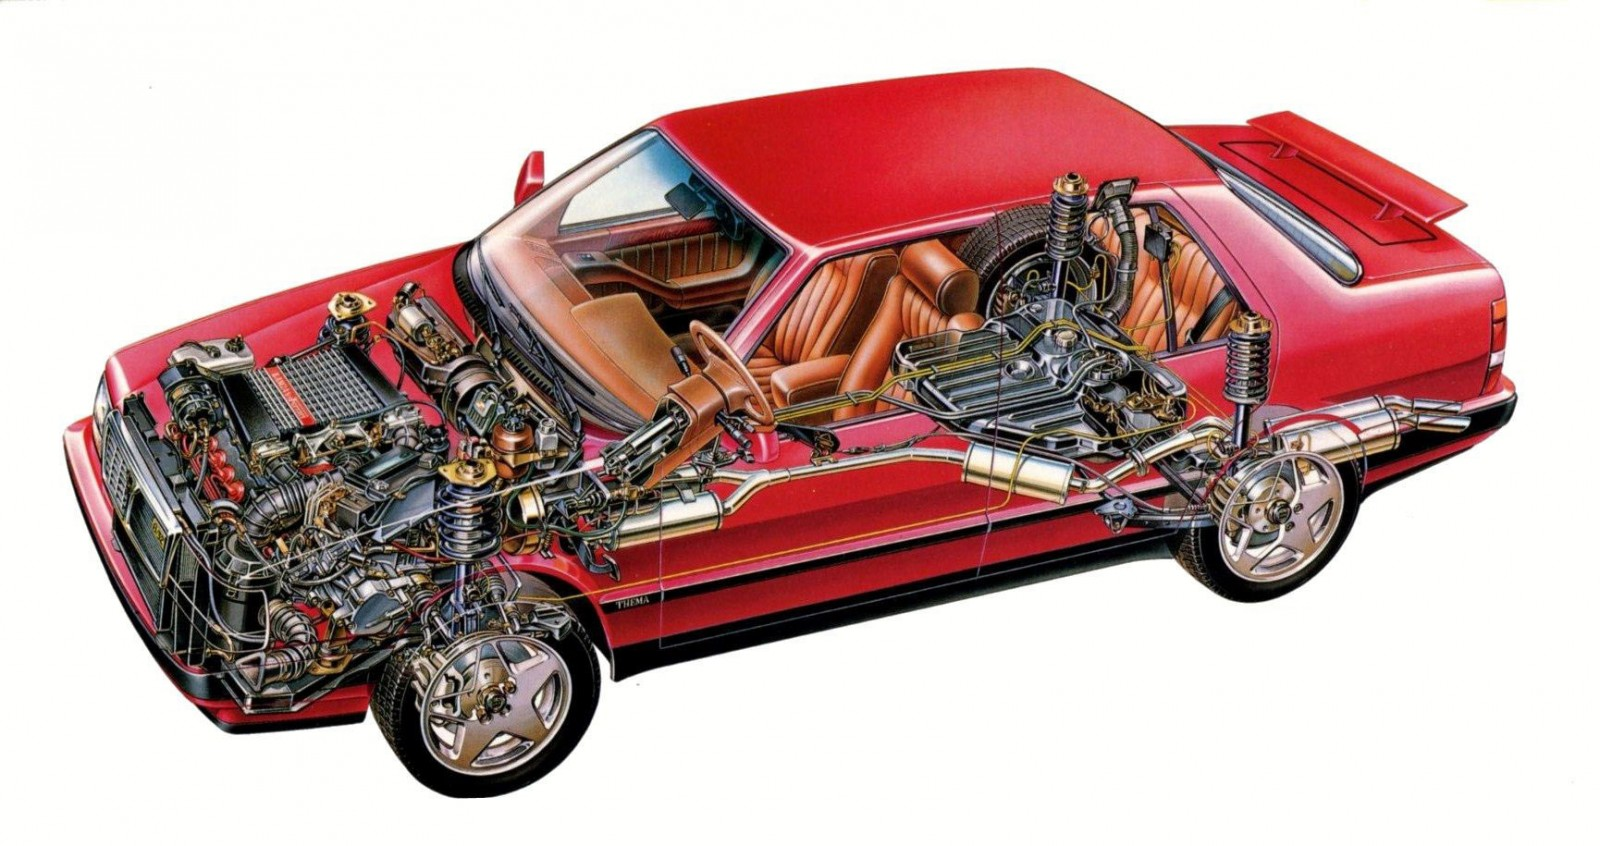 Utmanaren från Lancia - Thema 8.32